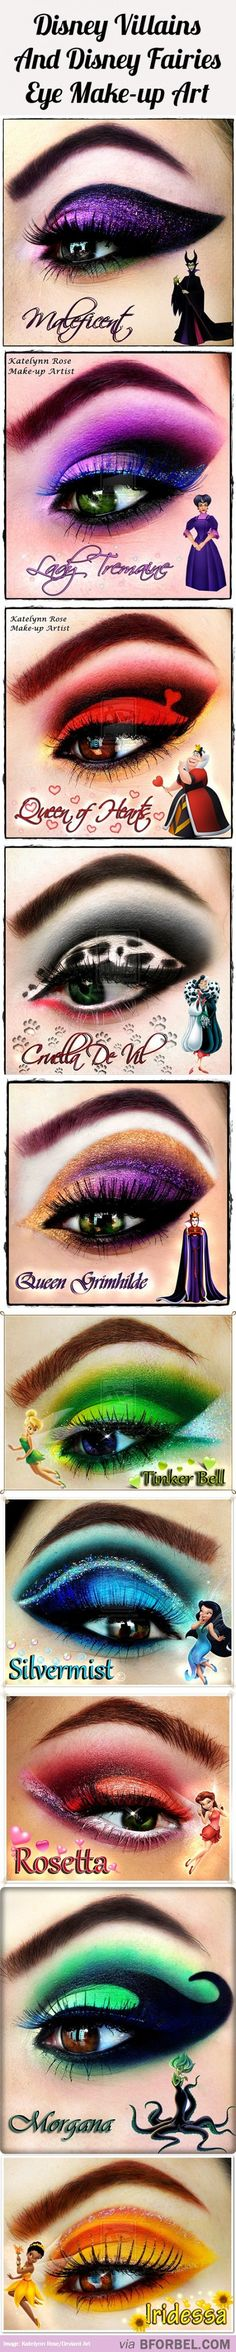 10 Disney Villains And Fairies Inspired Beautiful Eye Makeup...